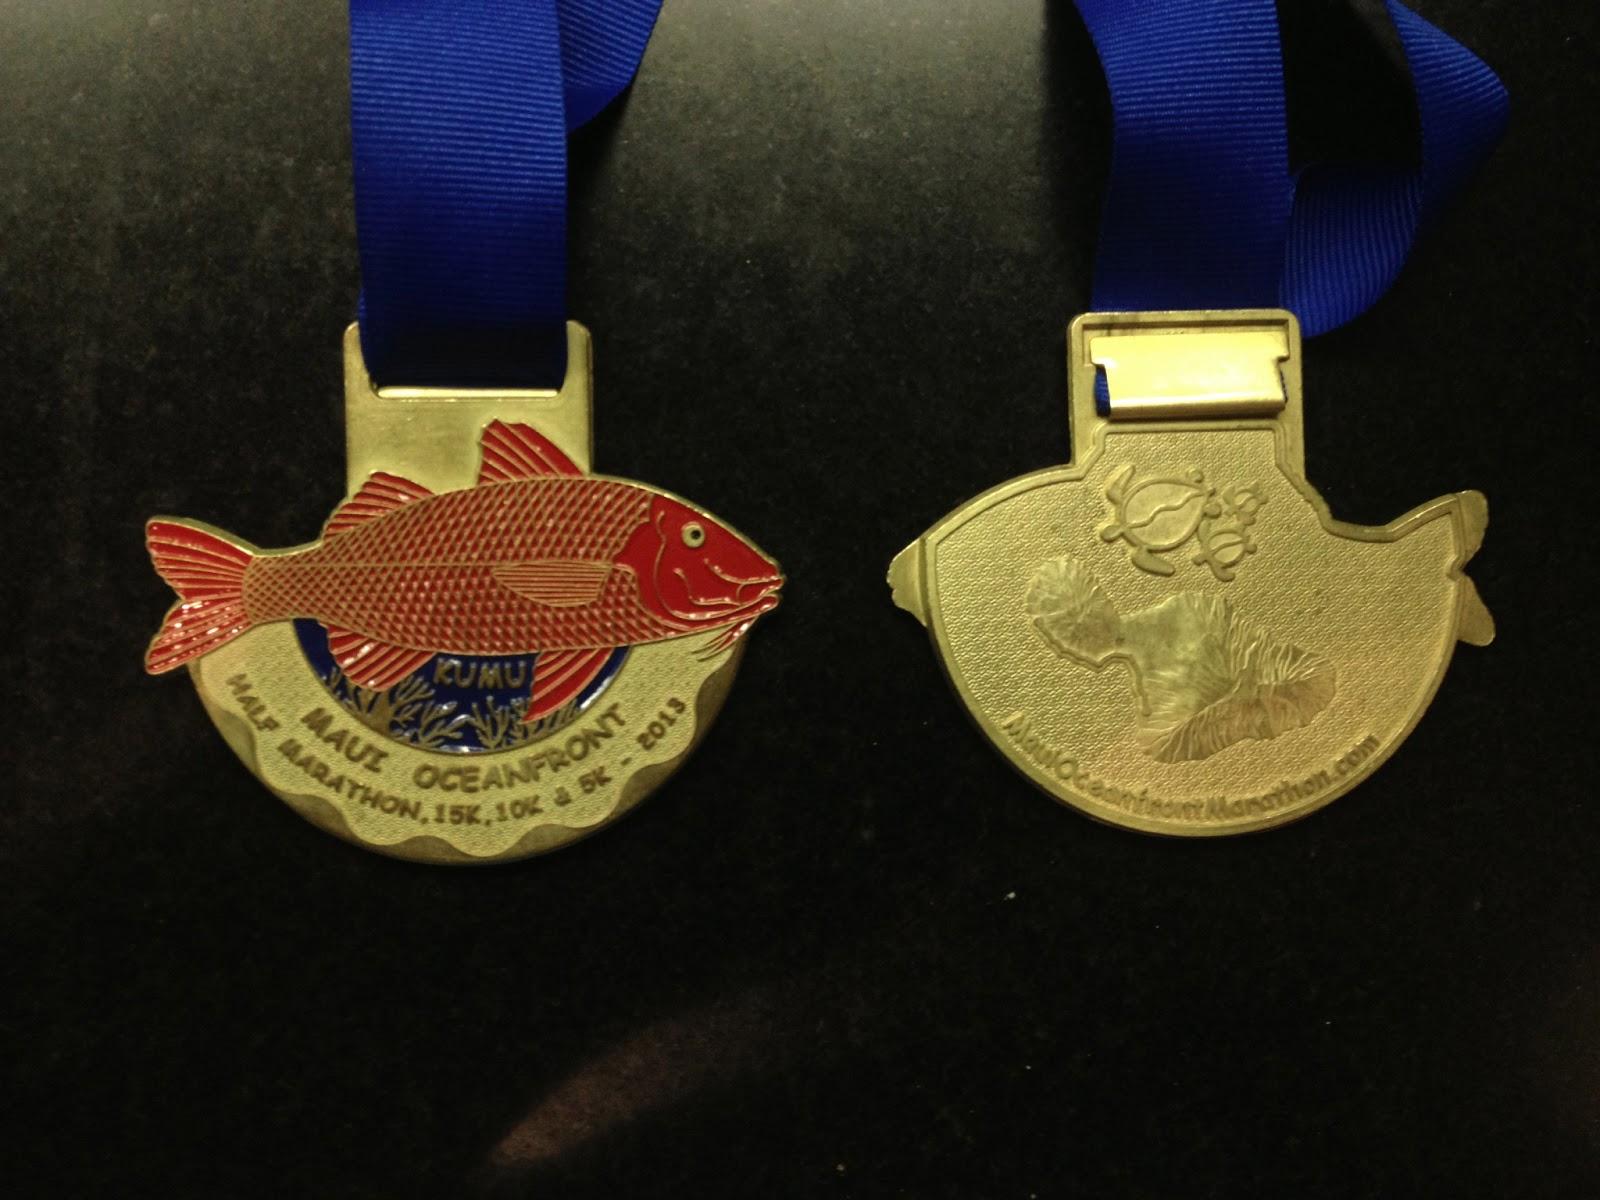 Maui Marathon 2013 Medals